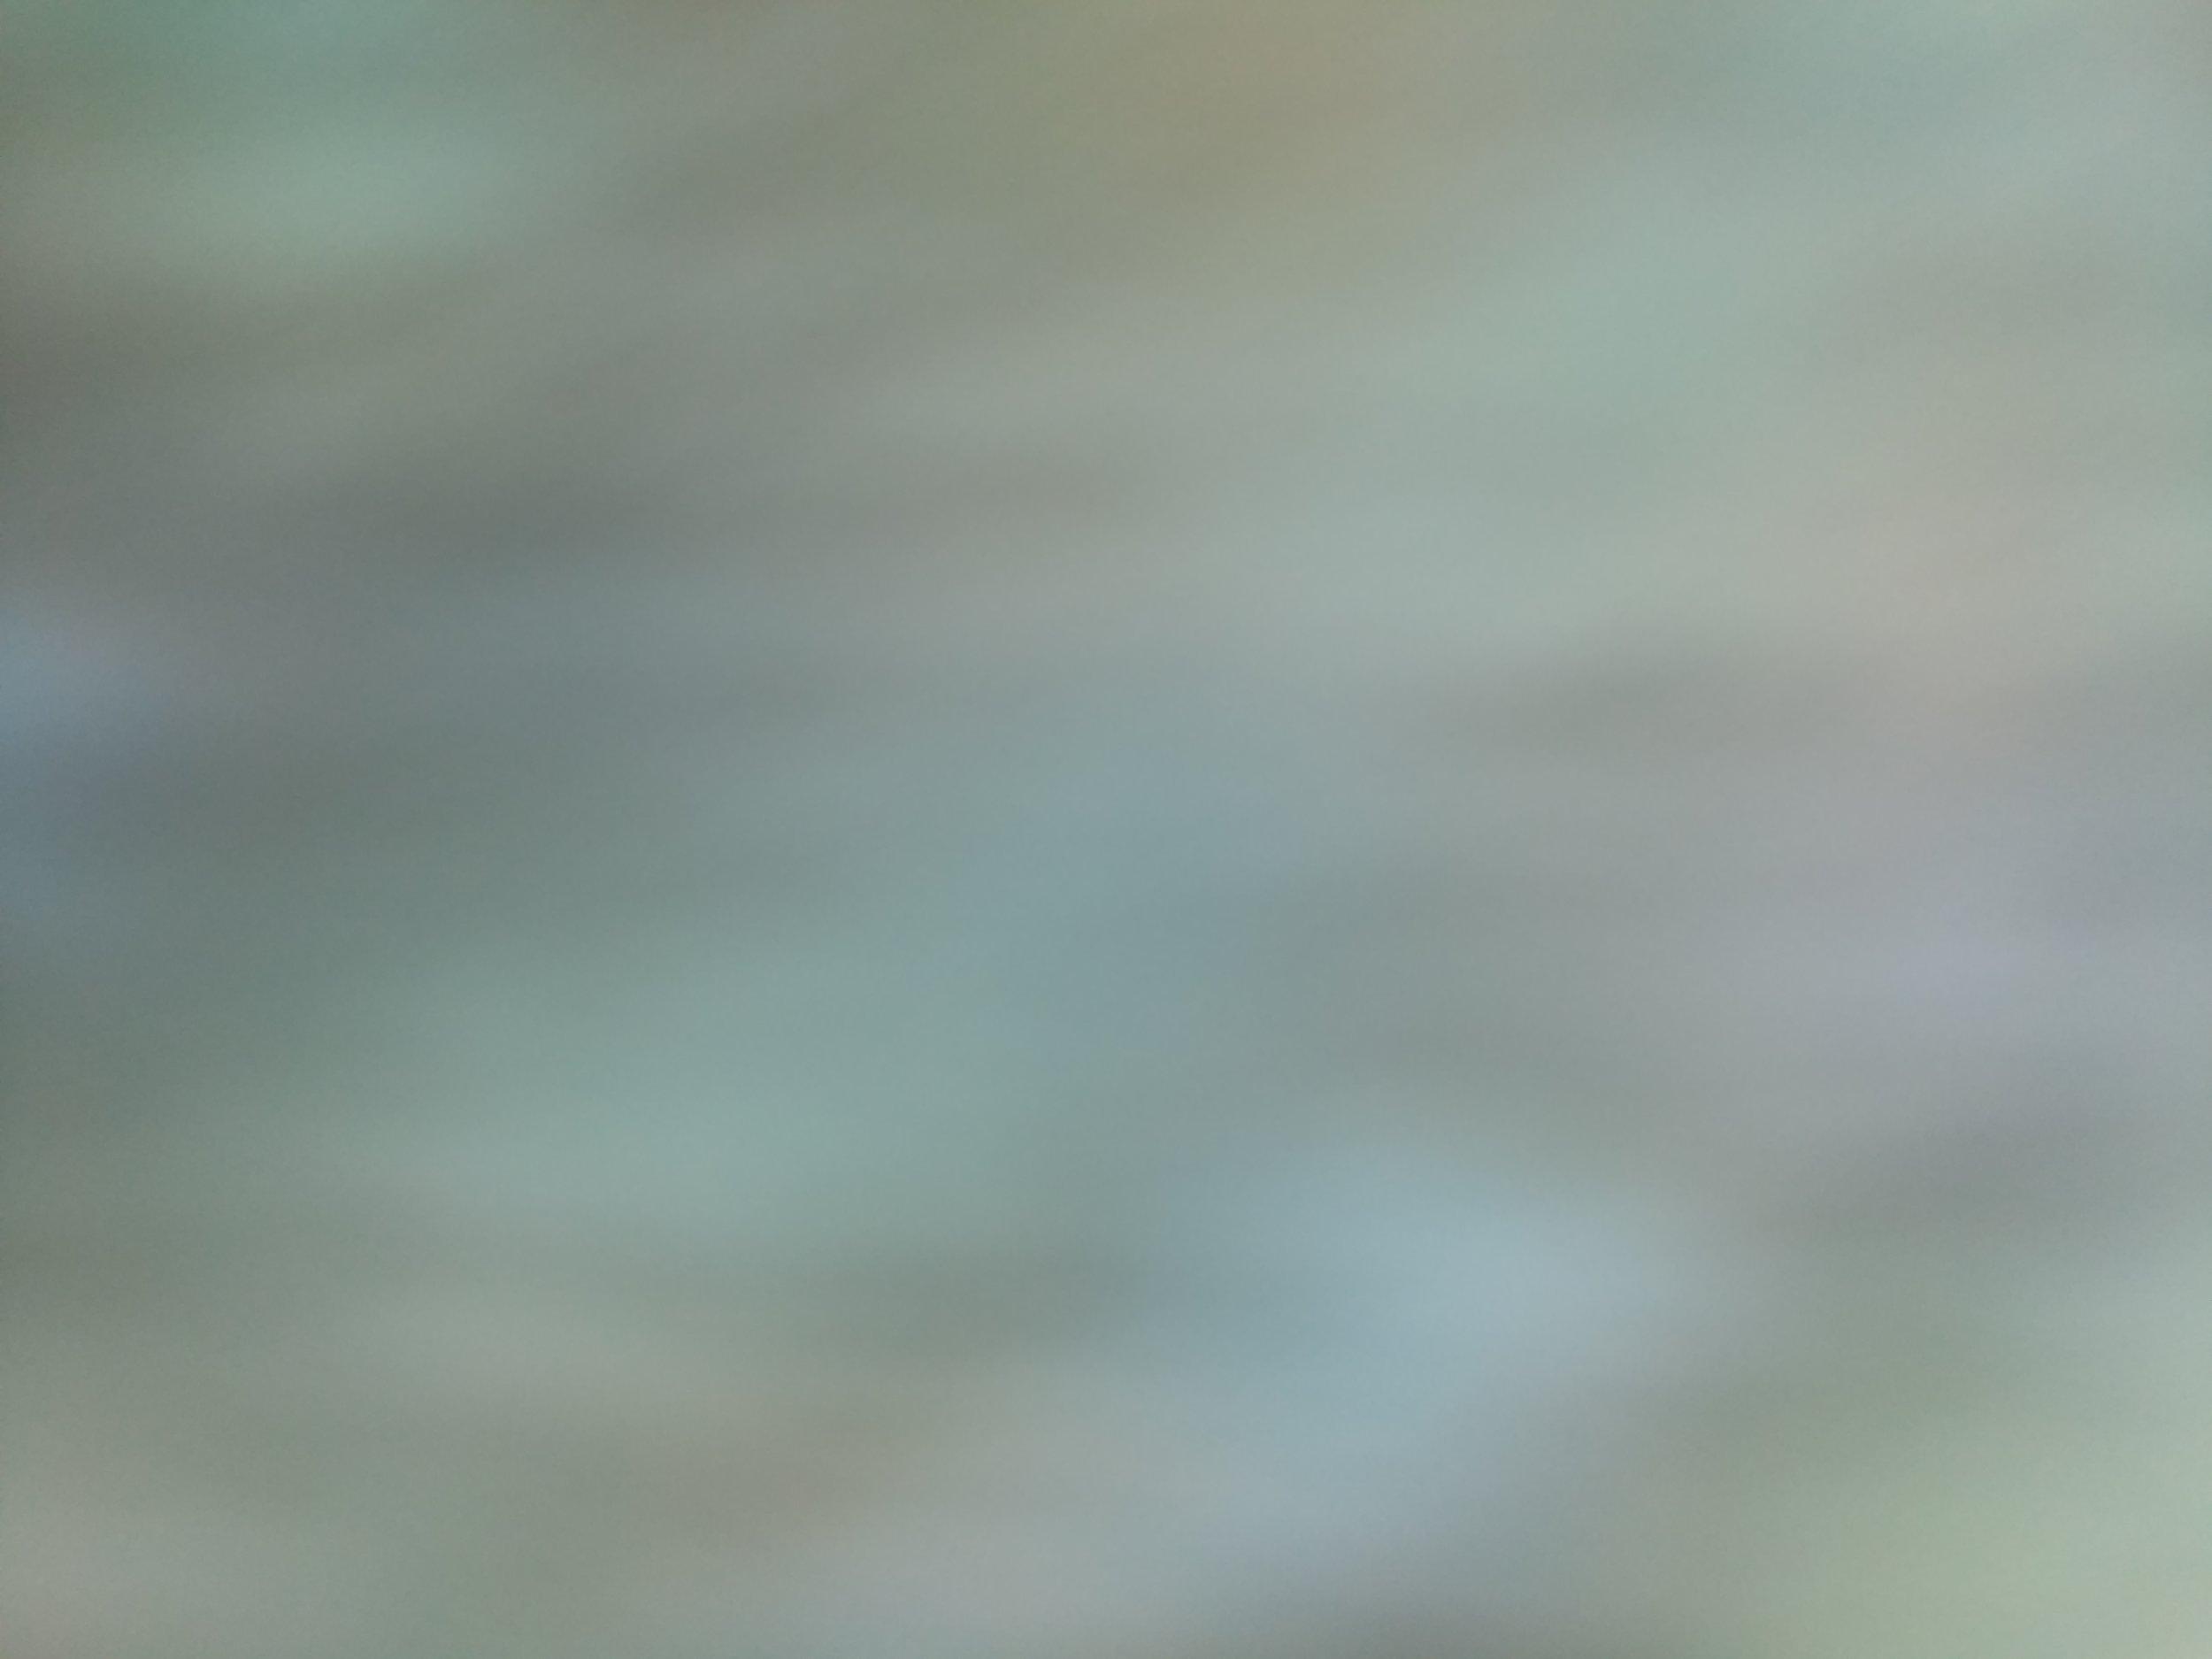 willroth-co-free-texture-gradient-044.jpg